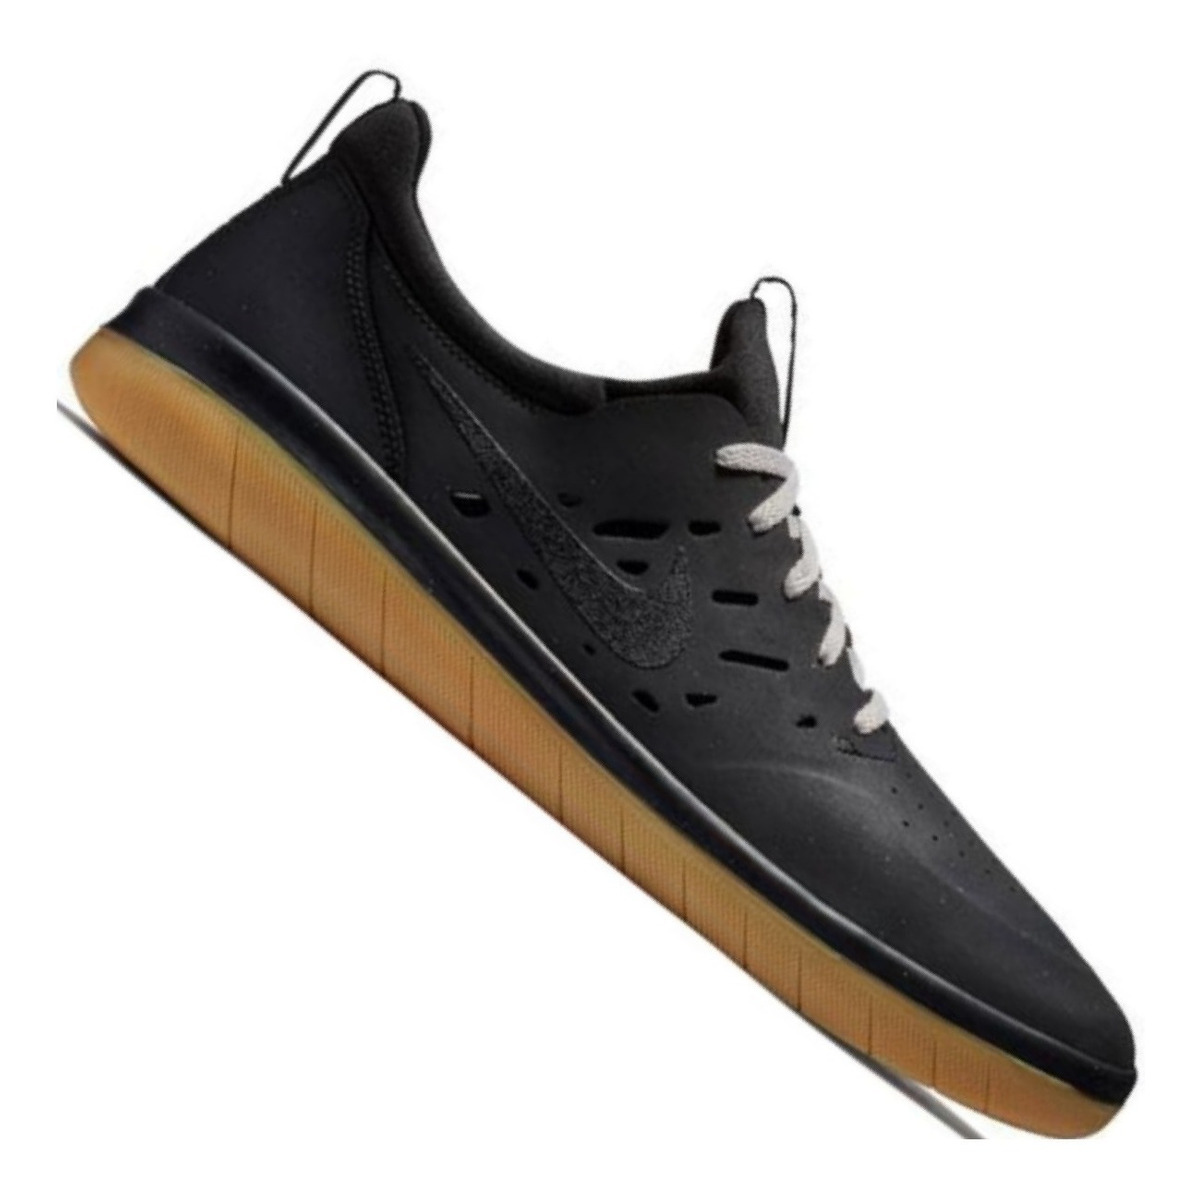 Zapatillas Nike Sb Nyjah Free Negras 360º De Agarre Black